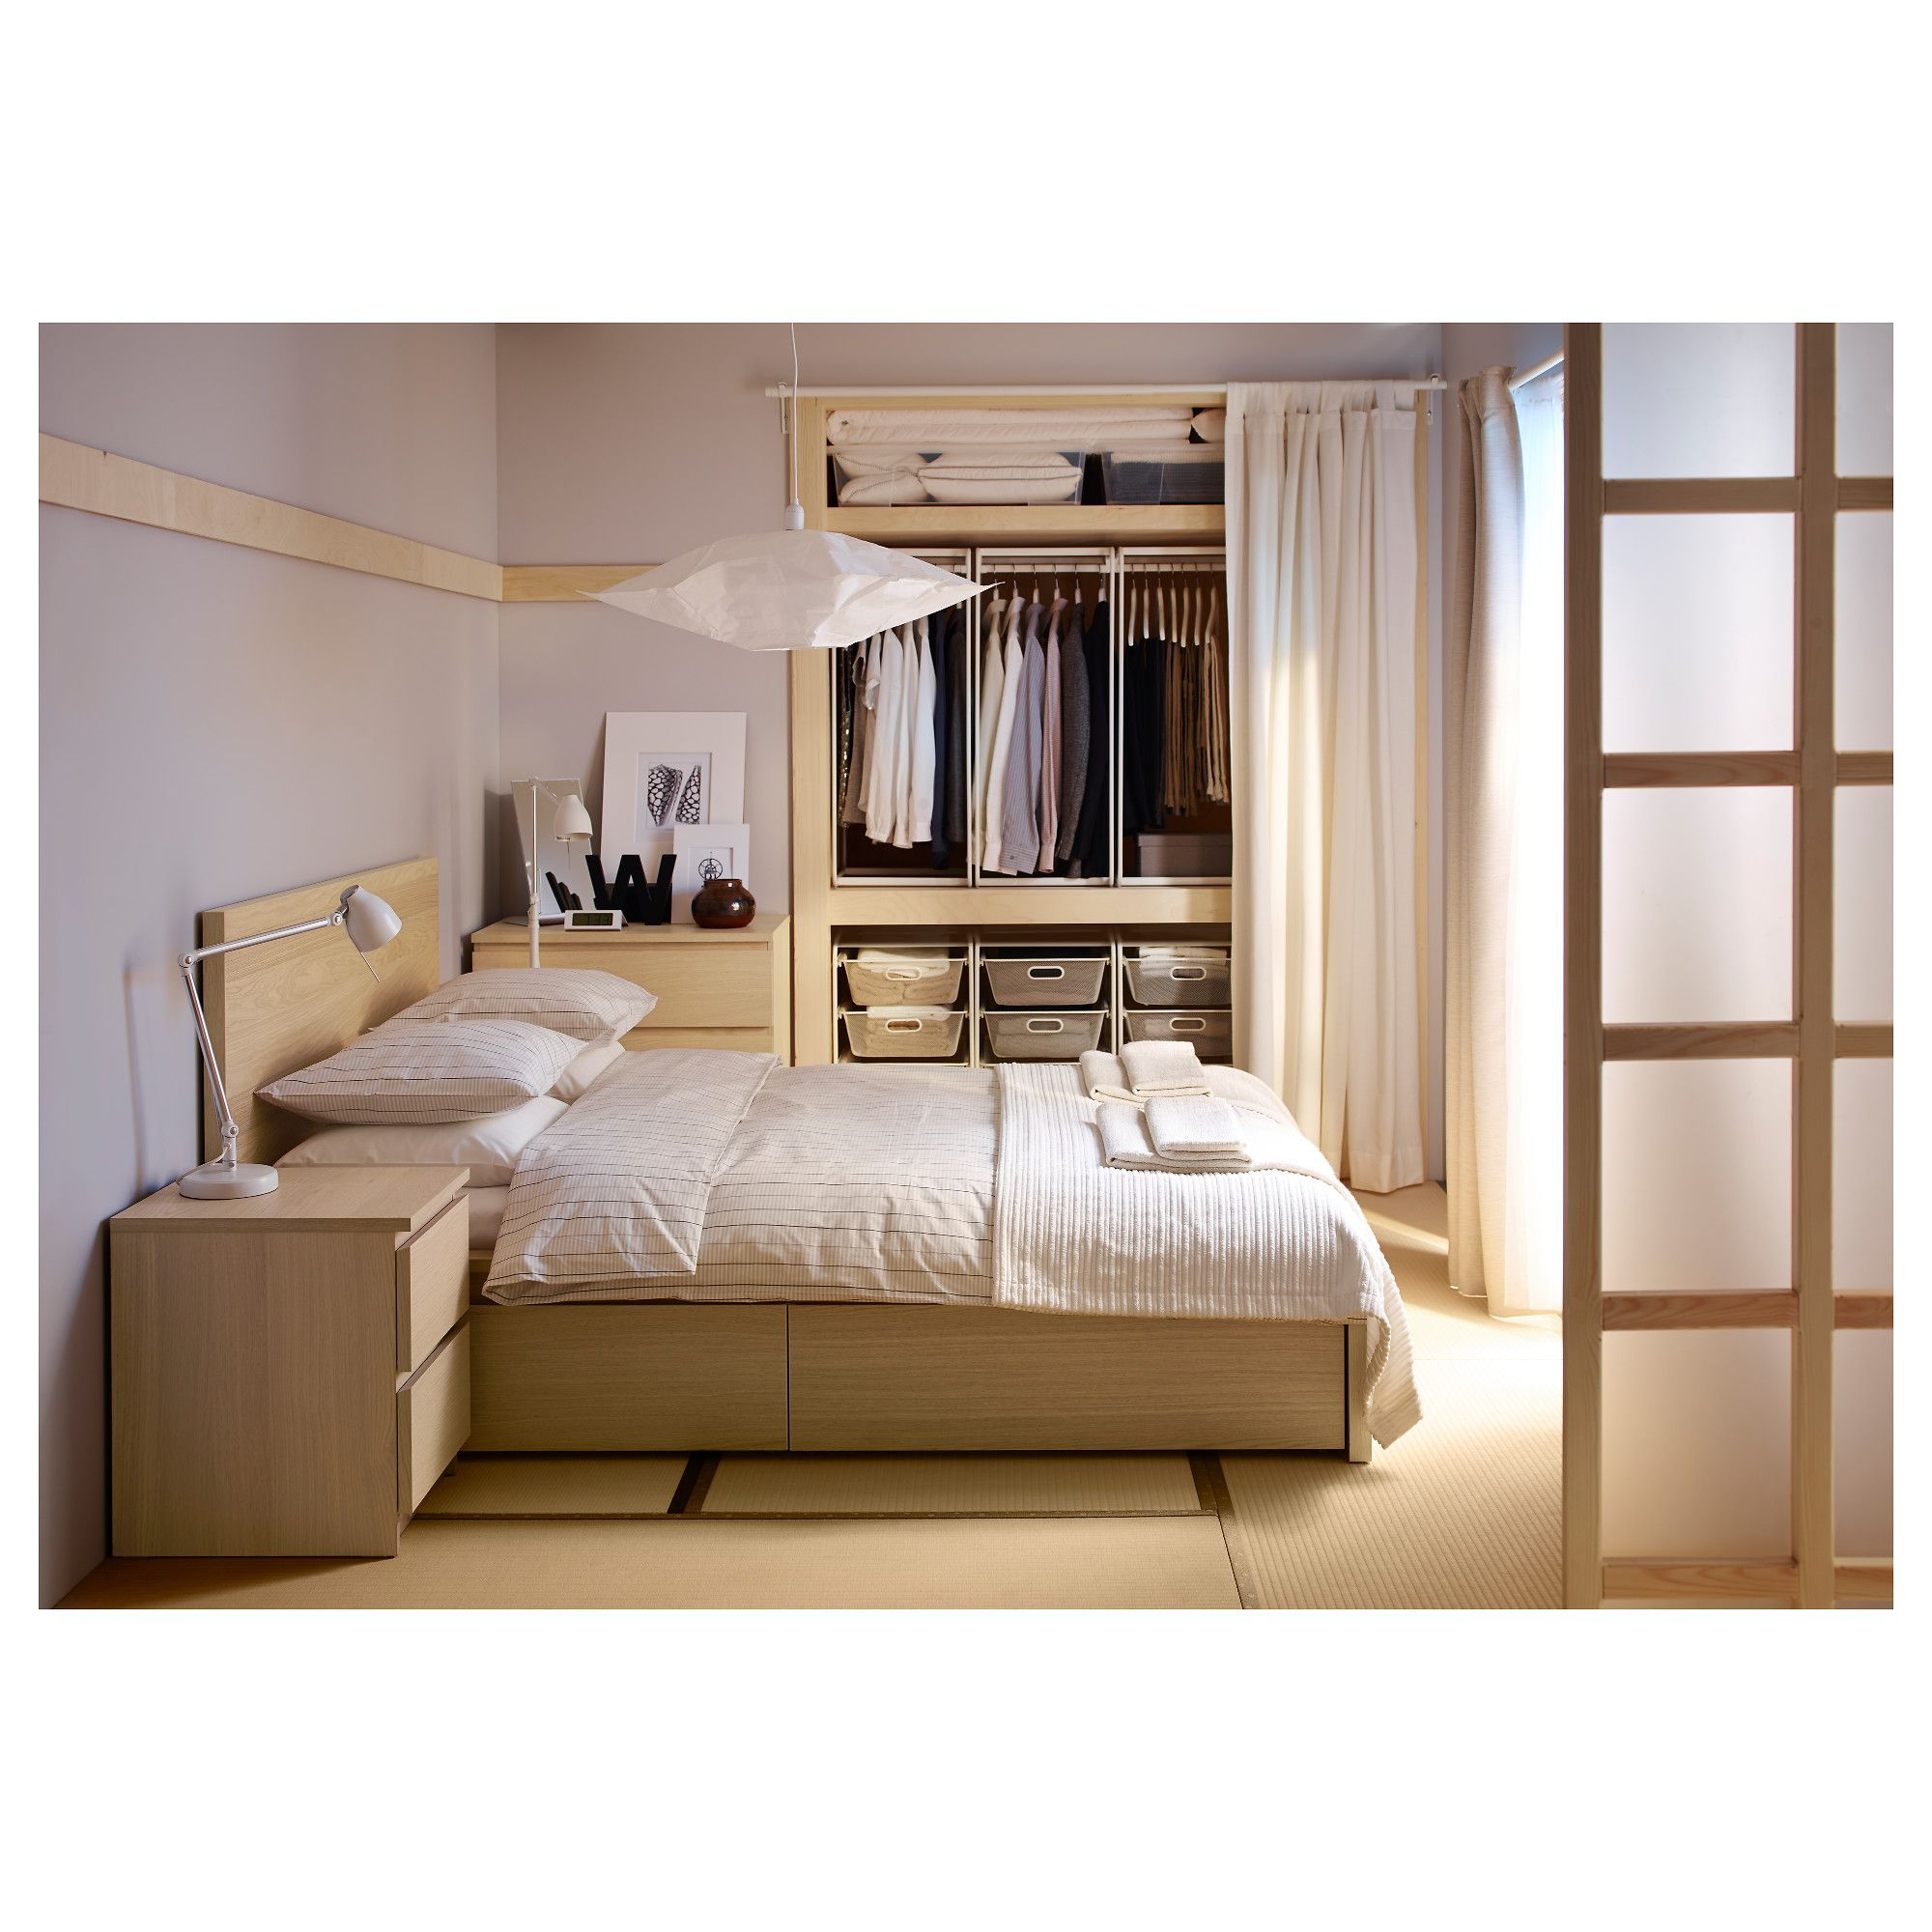 0370909 Ph121111 S5 Jpg 2000 2000 High Bed Frame Malm Bed